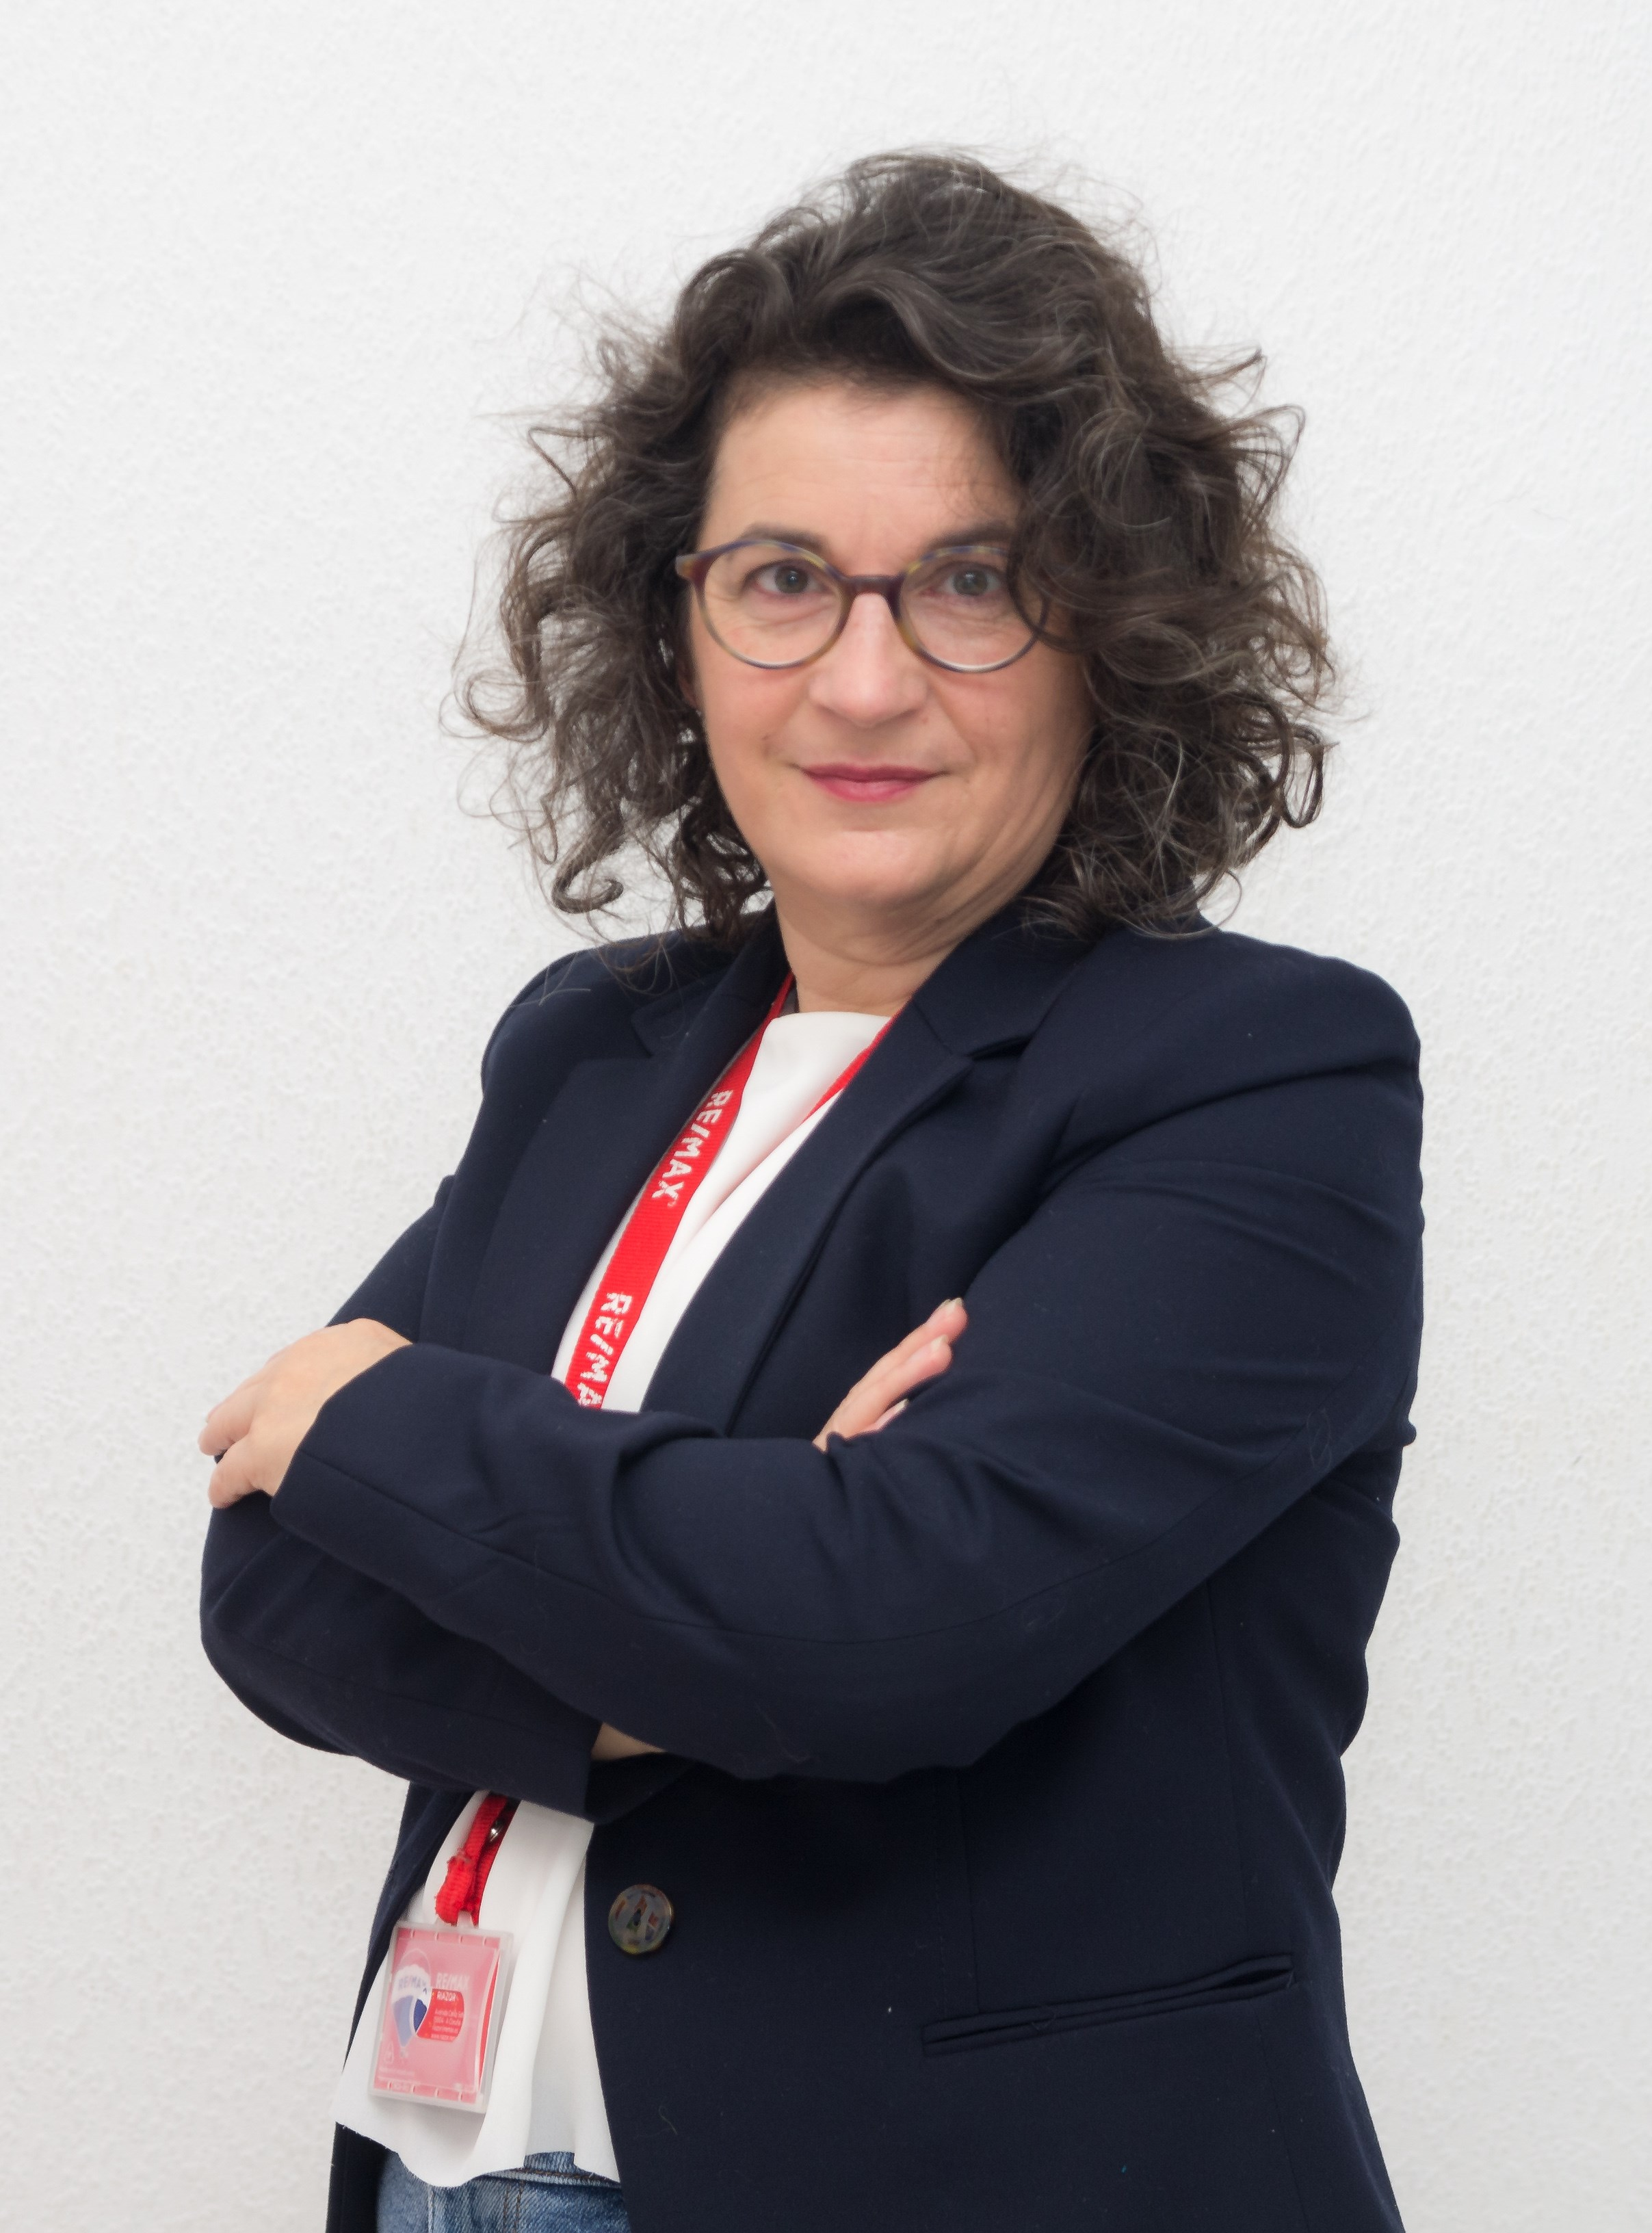 Yolanda Pena Rey